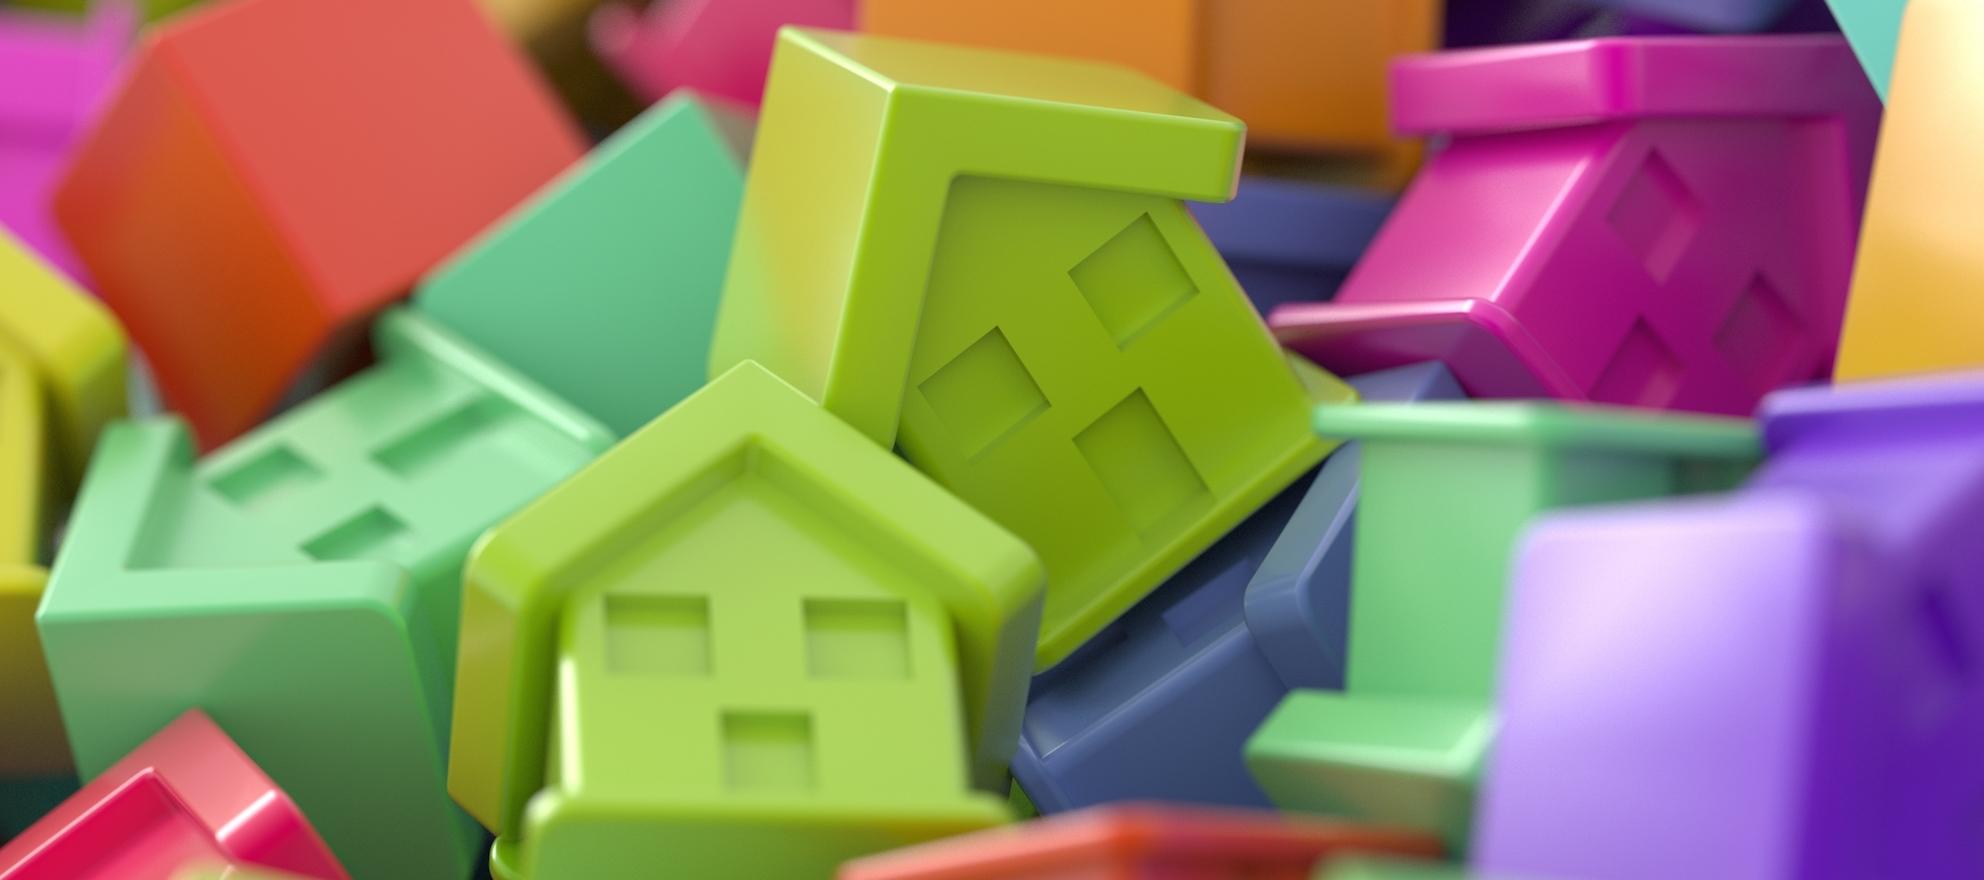 tostphoto / Shutterstock.com